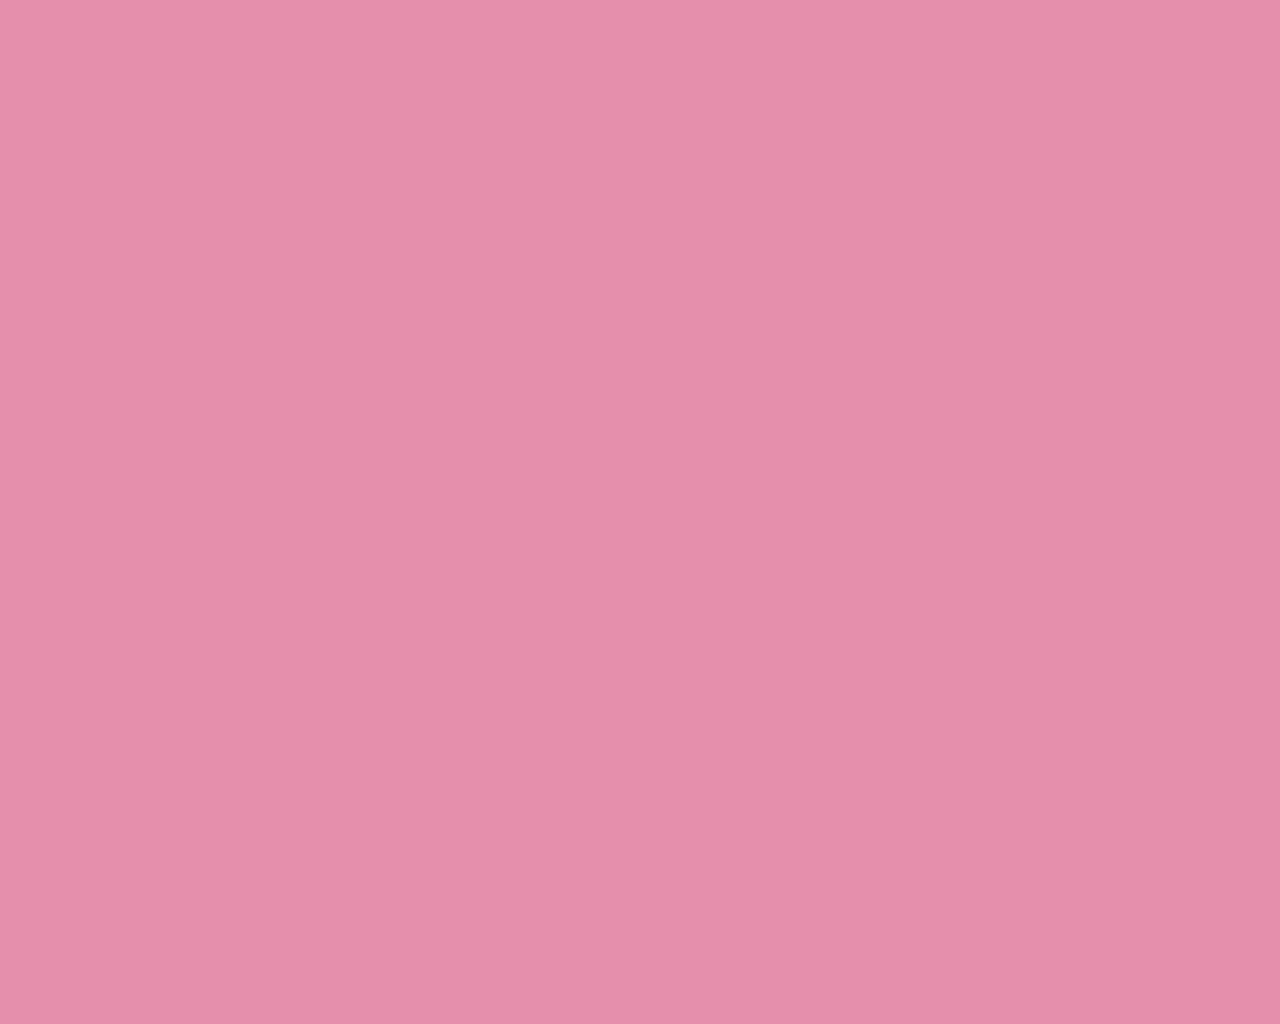 Solid Pink Wallpaper Border Solid pink wal 1280x1024